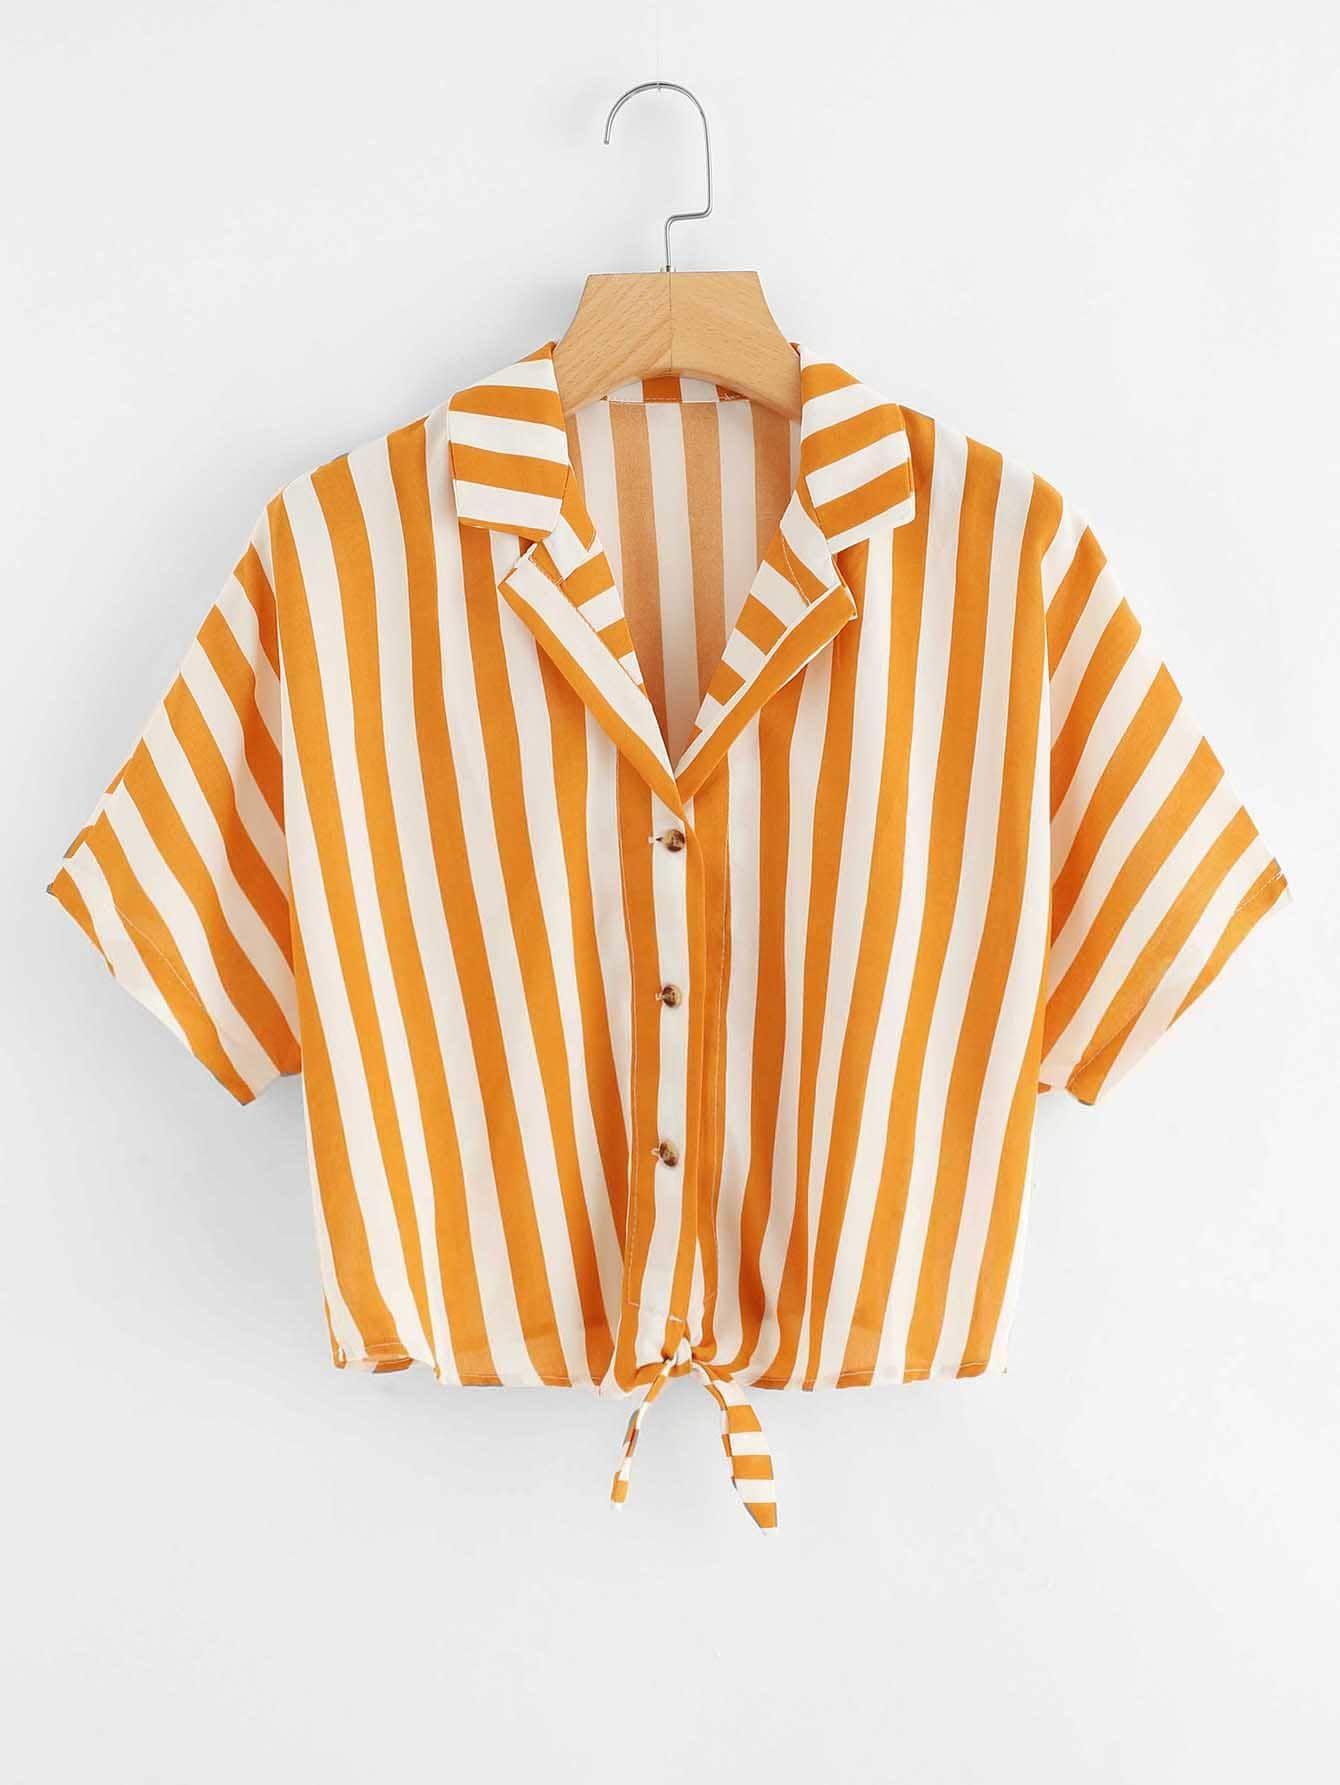 Knot Hem Striped Shirt Check out this Knot Hem Striped